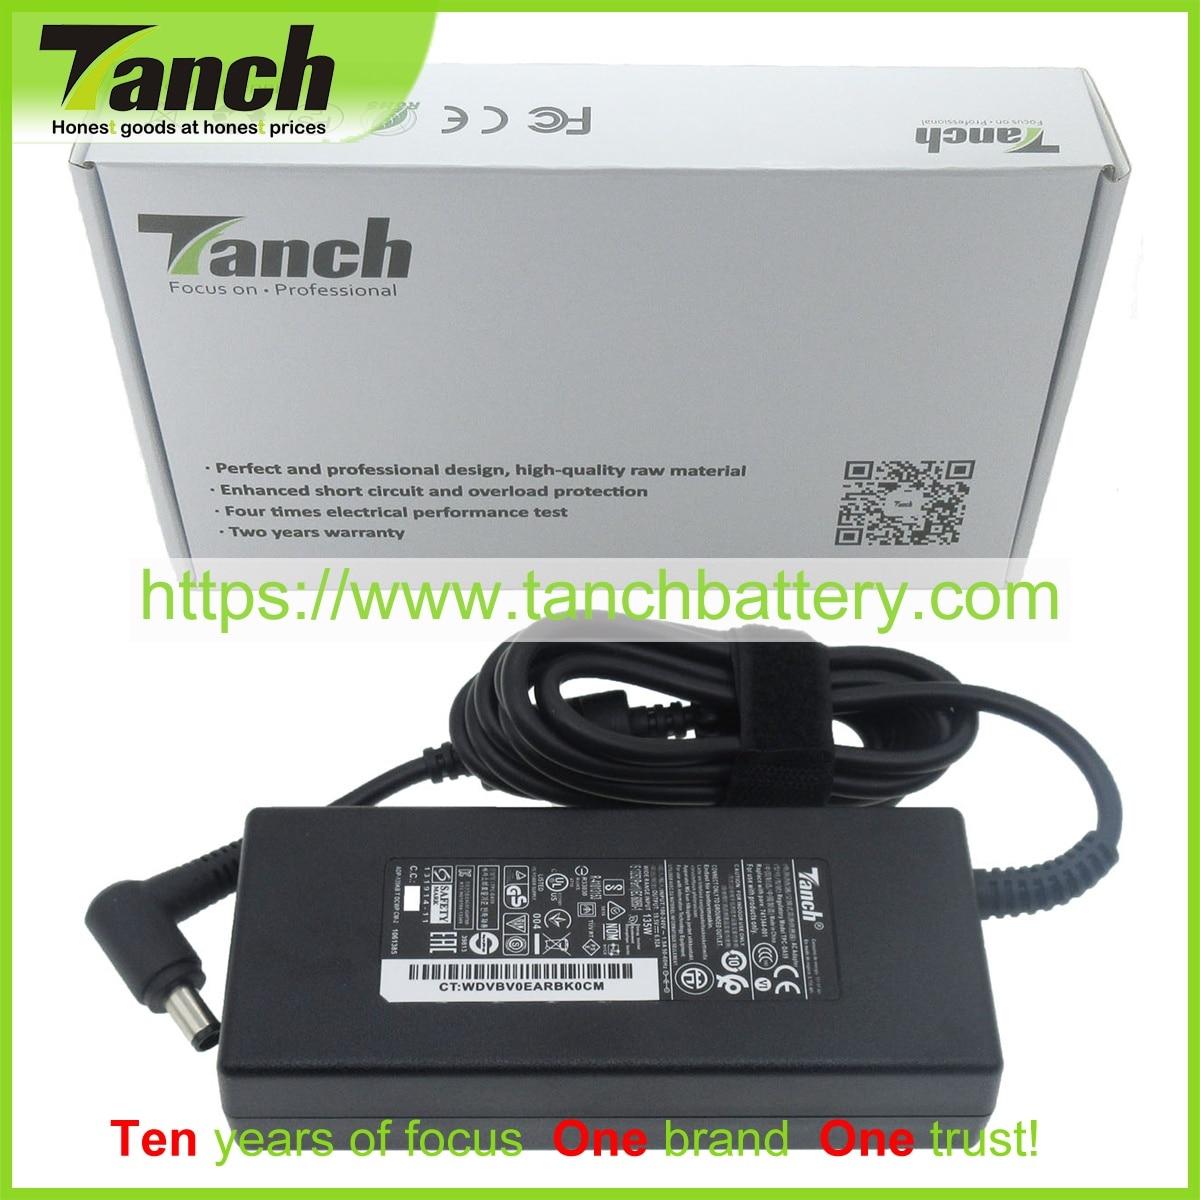 ac para Msi Tanch Portátil Adaptador 741344-001 Gl63 8rd Gp62m 7rdx Aspire 1522 8rd-067 Lmi Wlmi 19.5v 135w Adp-135kb t